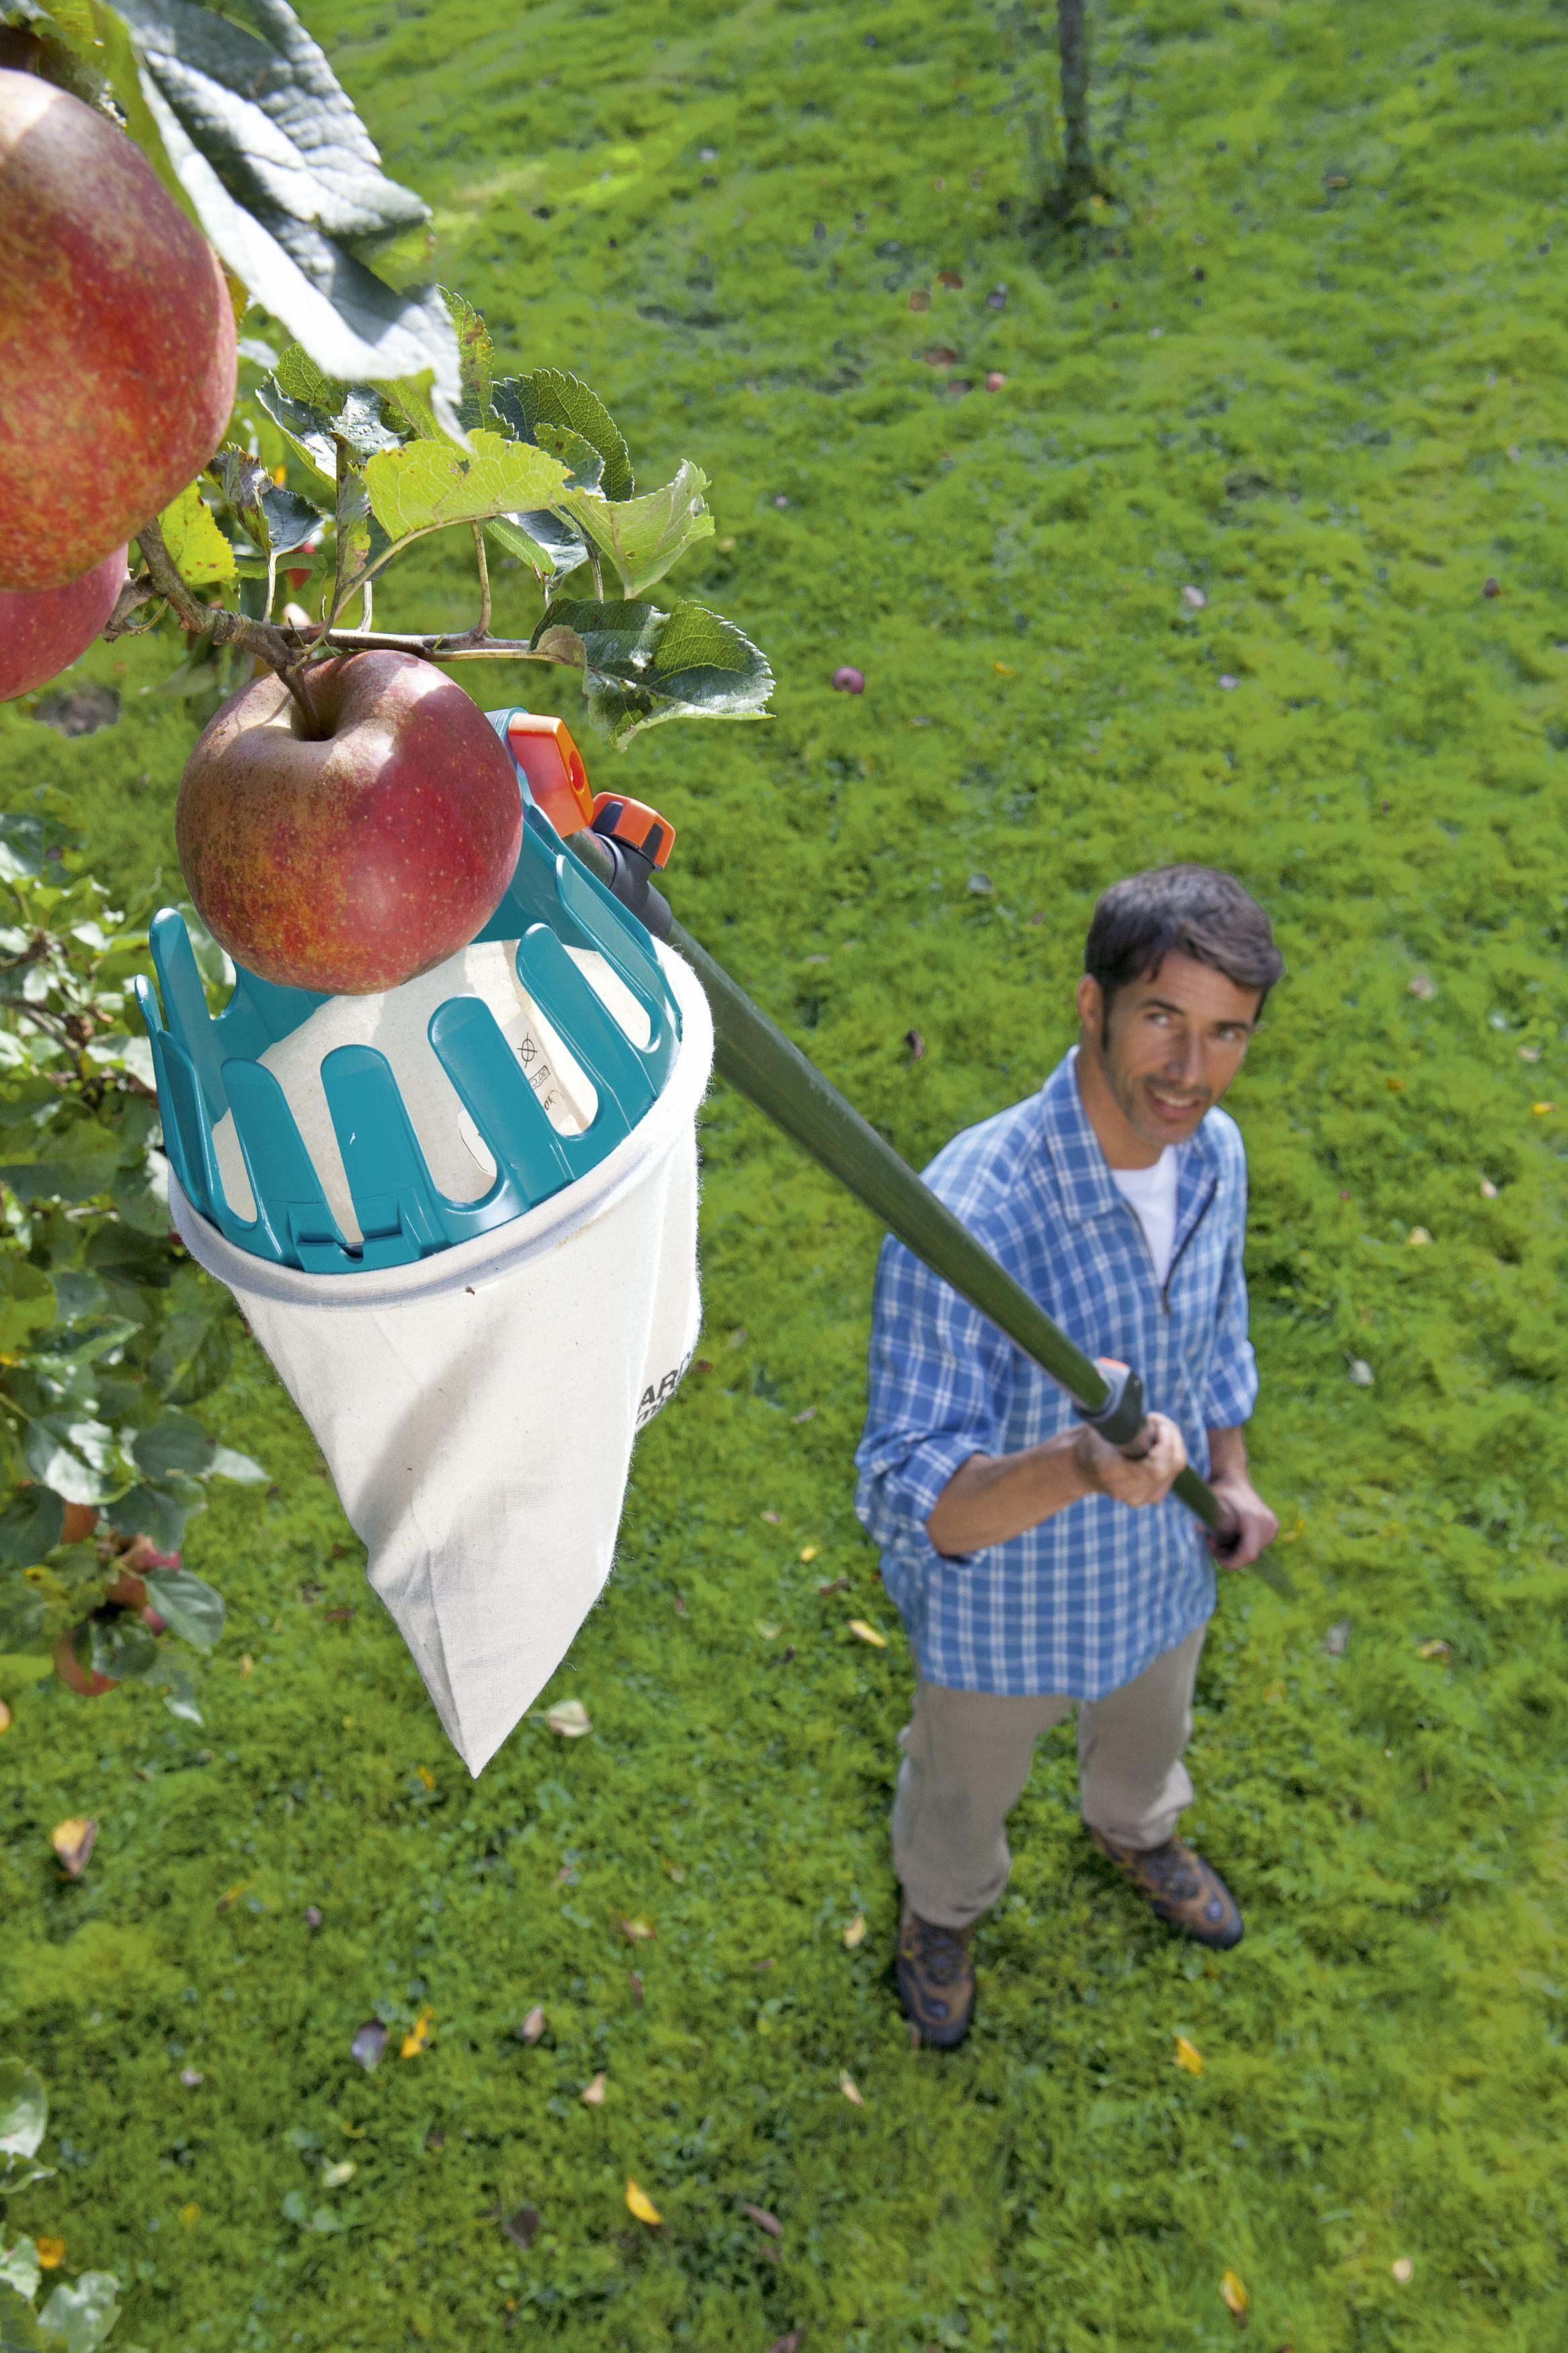 Fruitplukker gardena